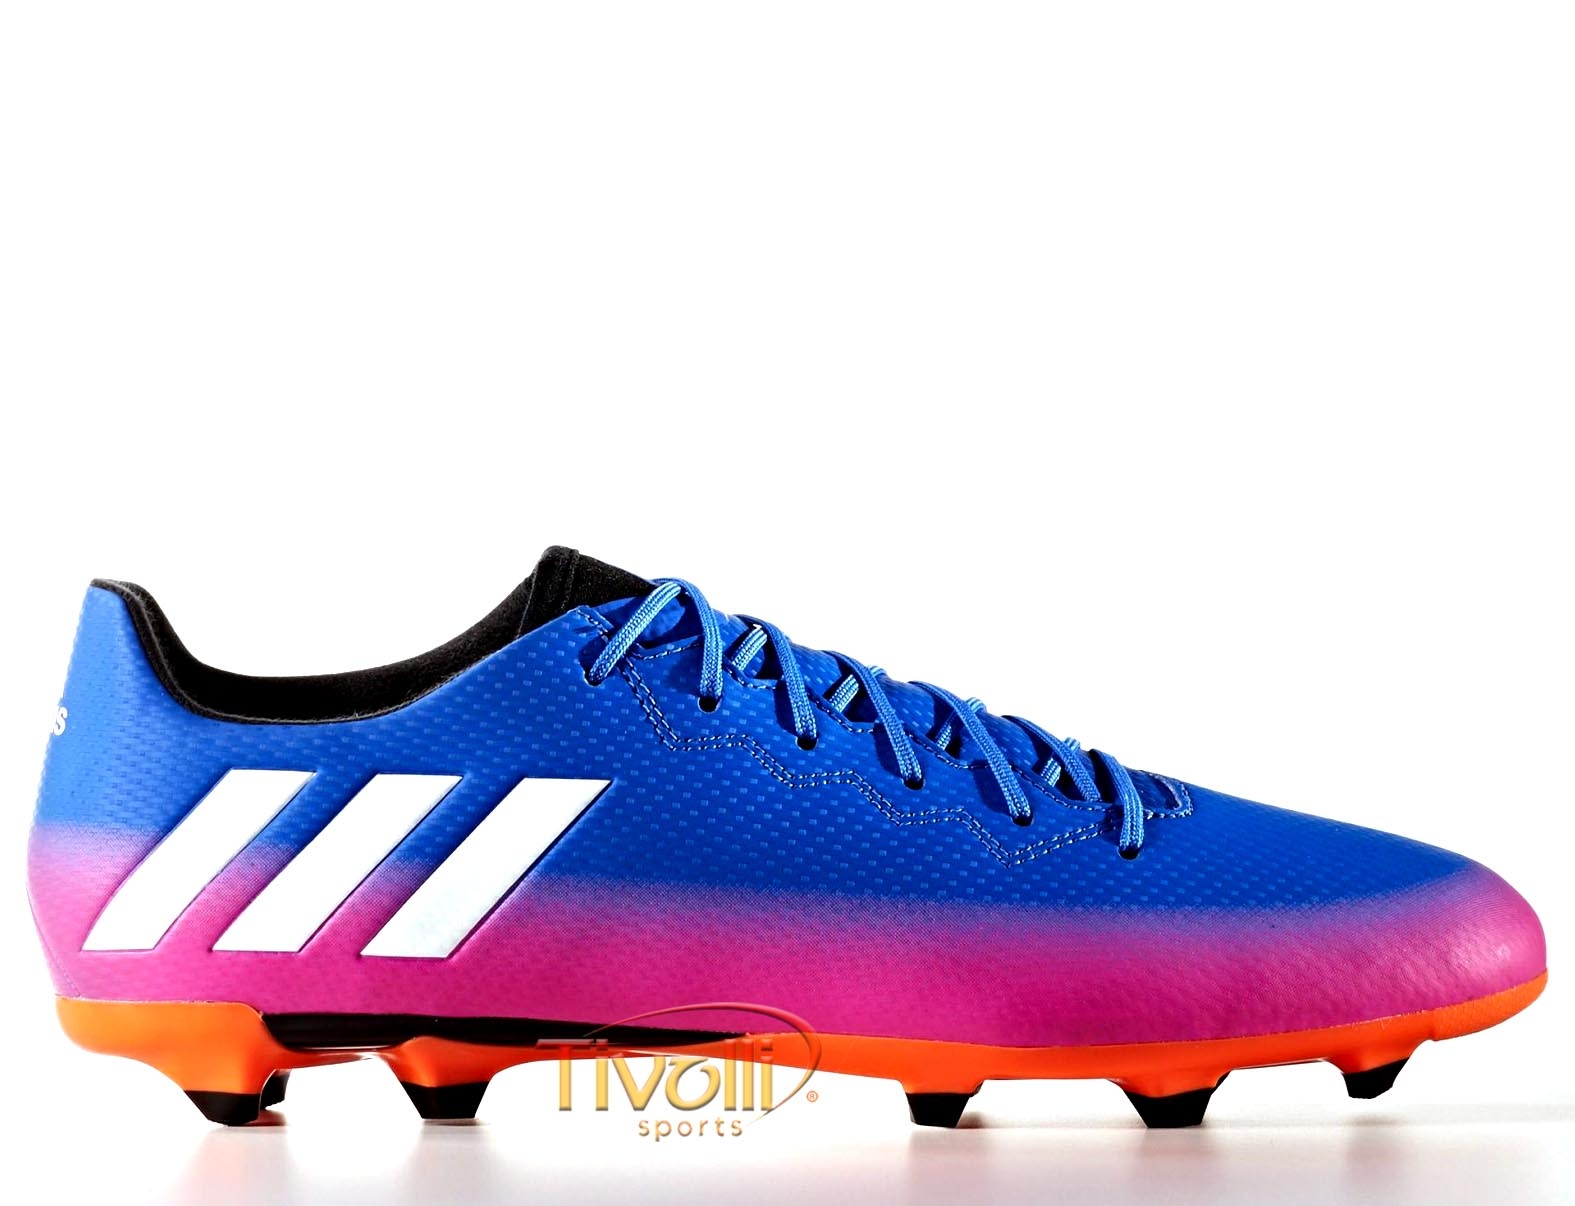 66c23b1b691 Chuteira Adidas Messi 16.3 Firm Ground FG Campo